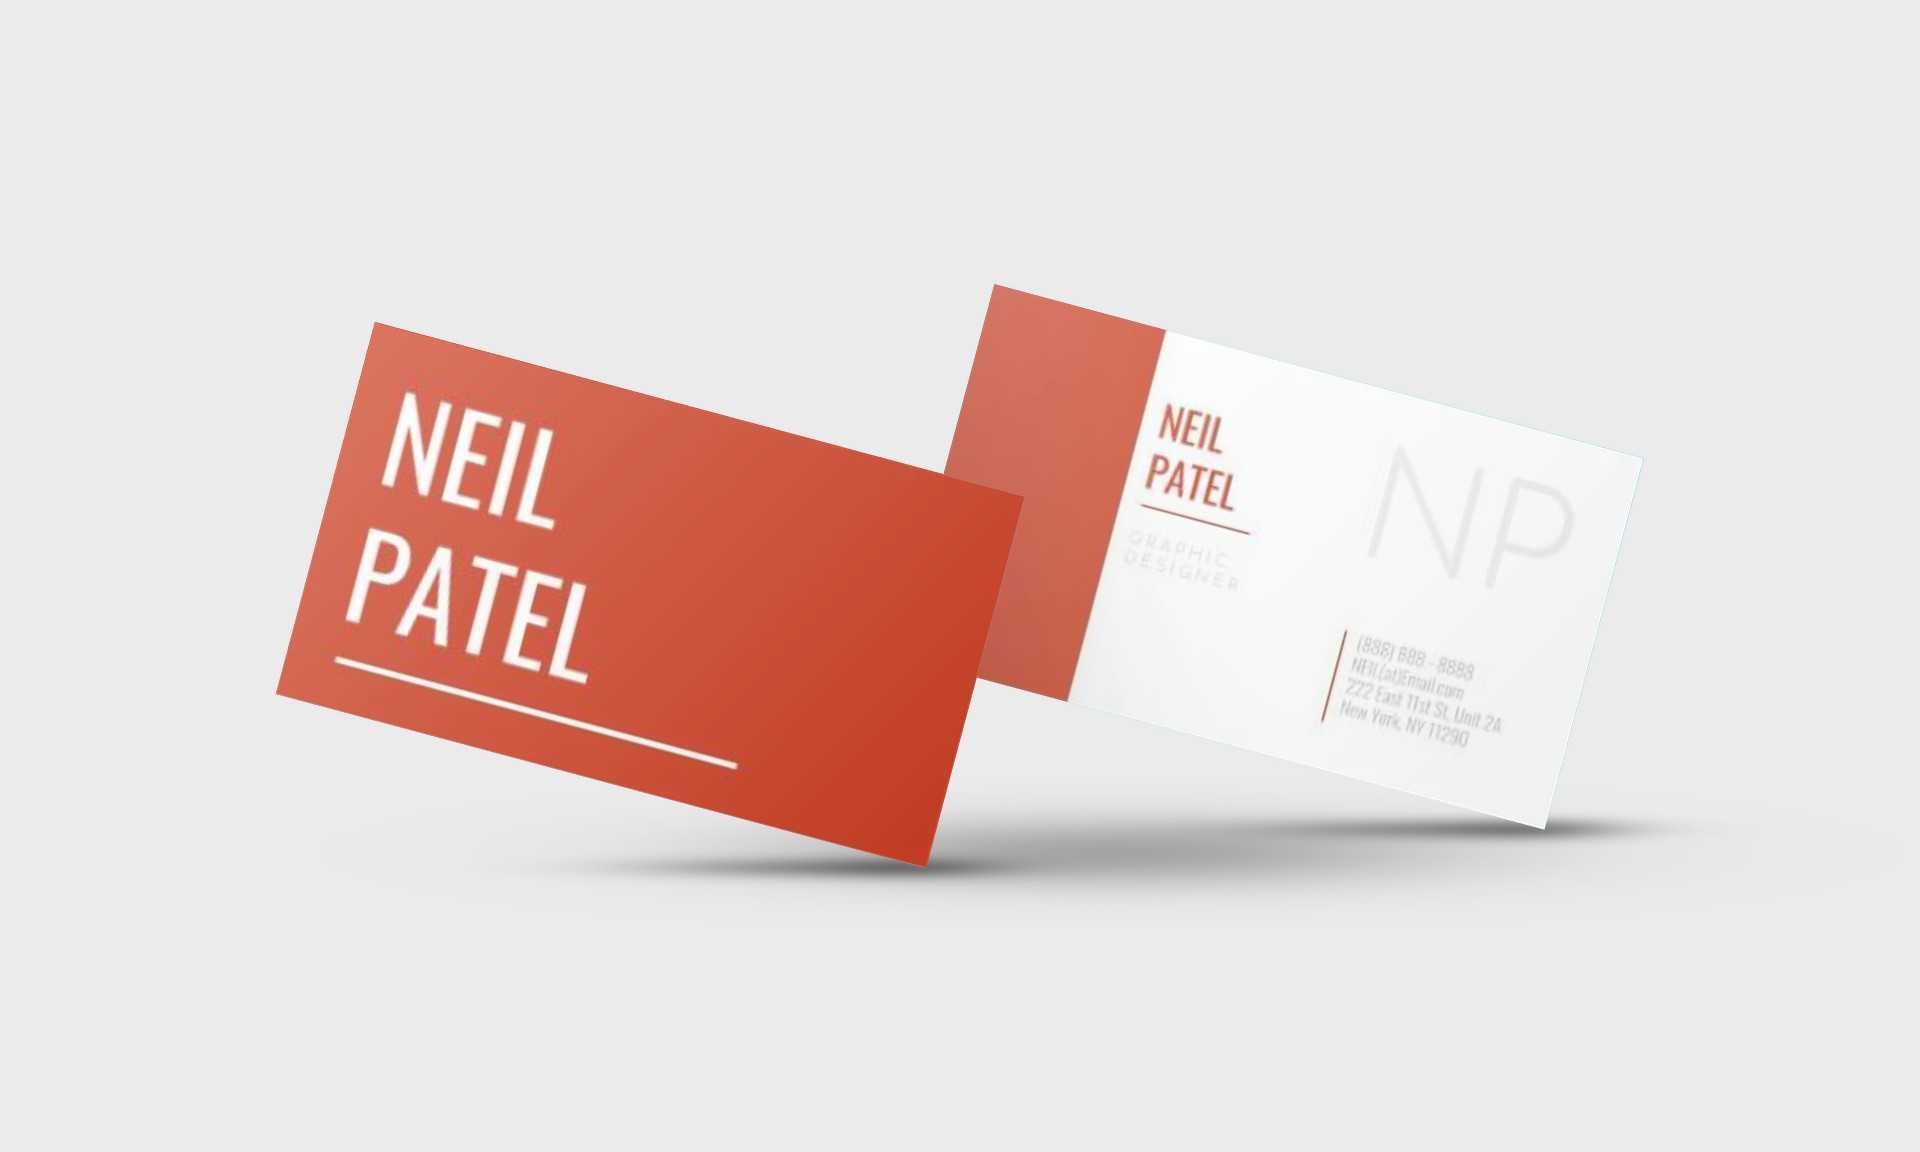 Neil Patel Google Docs Business Card Template - Stand Out Shop Inside Google Docs Business Card Template